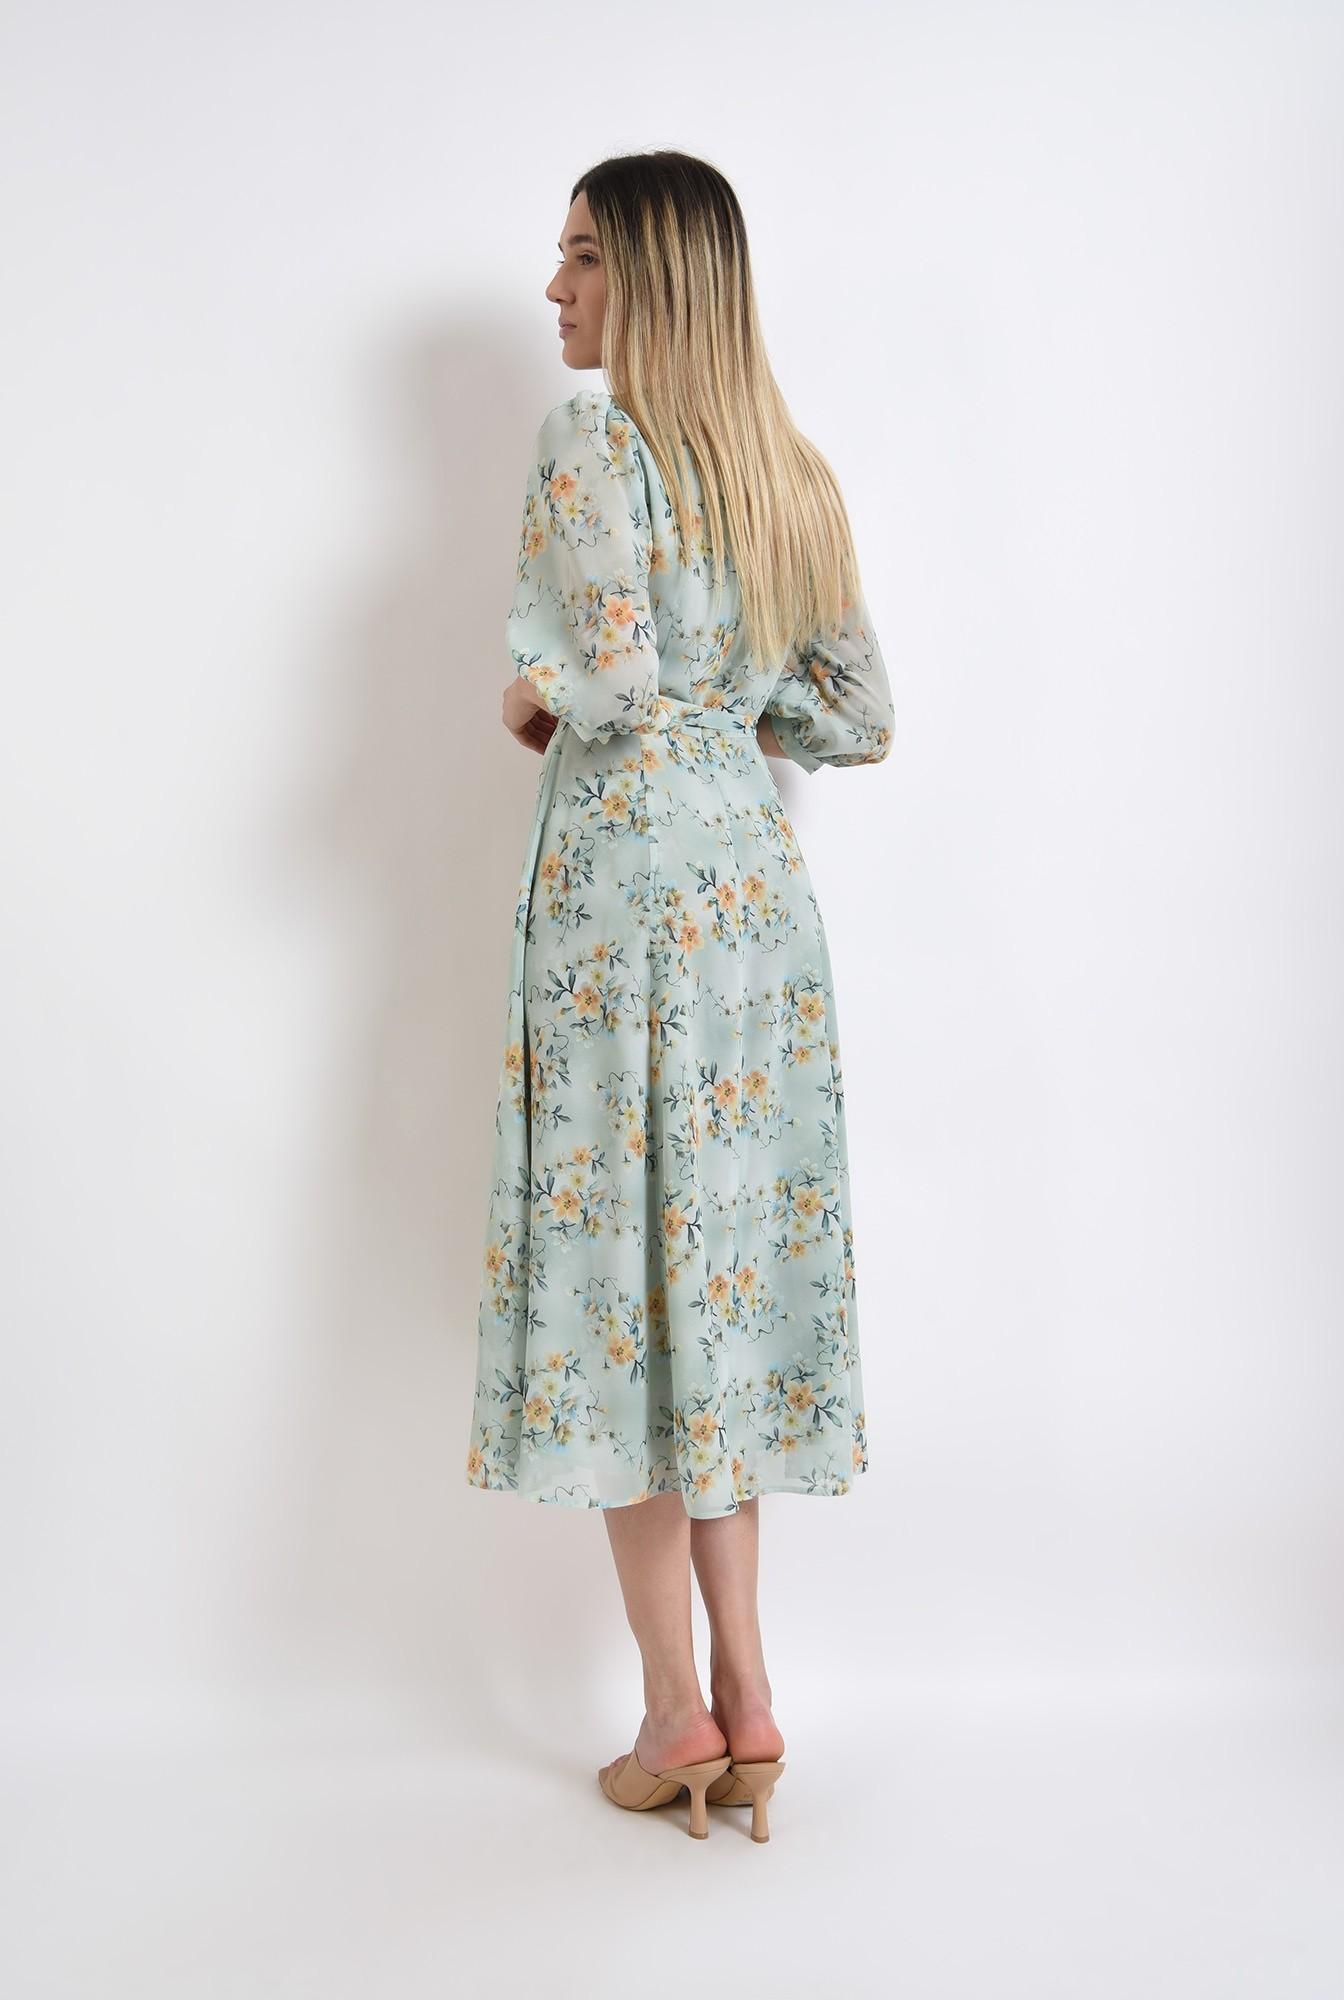 1 - rochie eleganta, verde, pastel, cu flori, poema, evazata